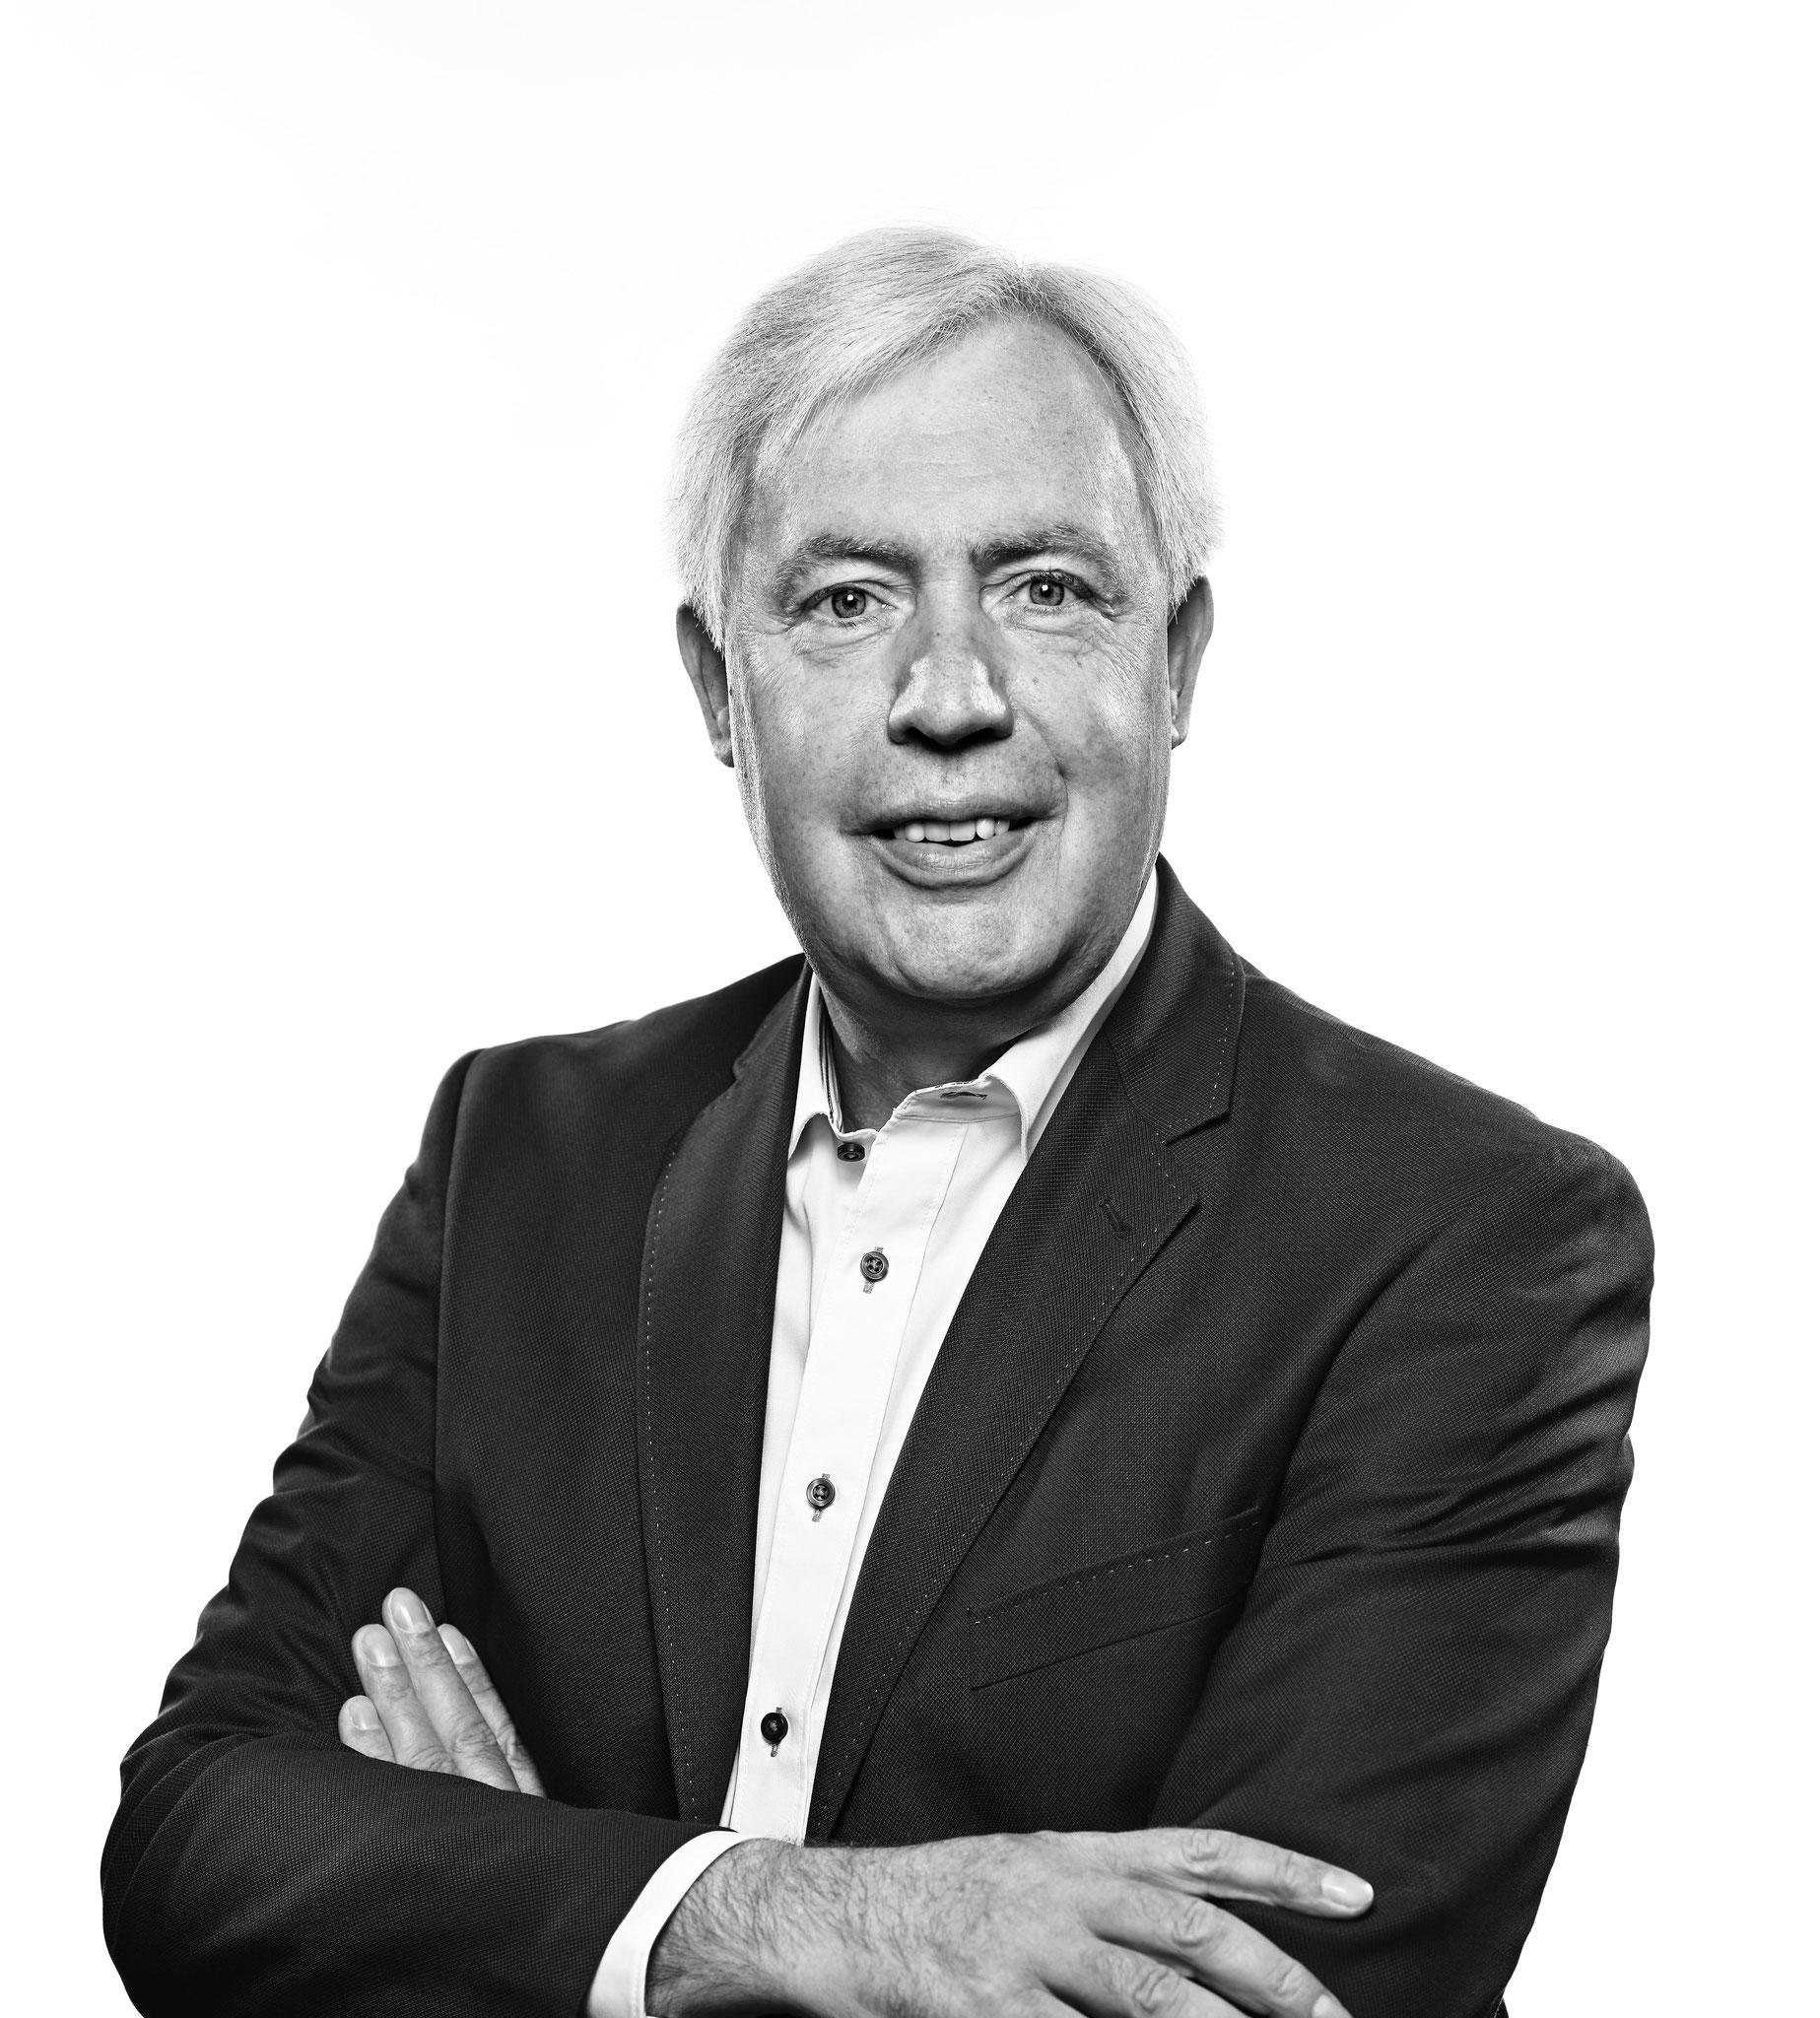 Listenplatz 1: Stefan Wimmers